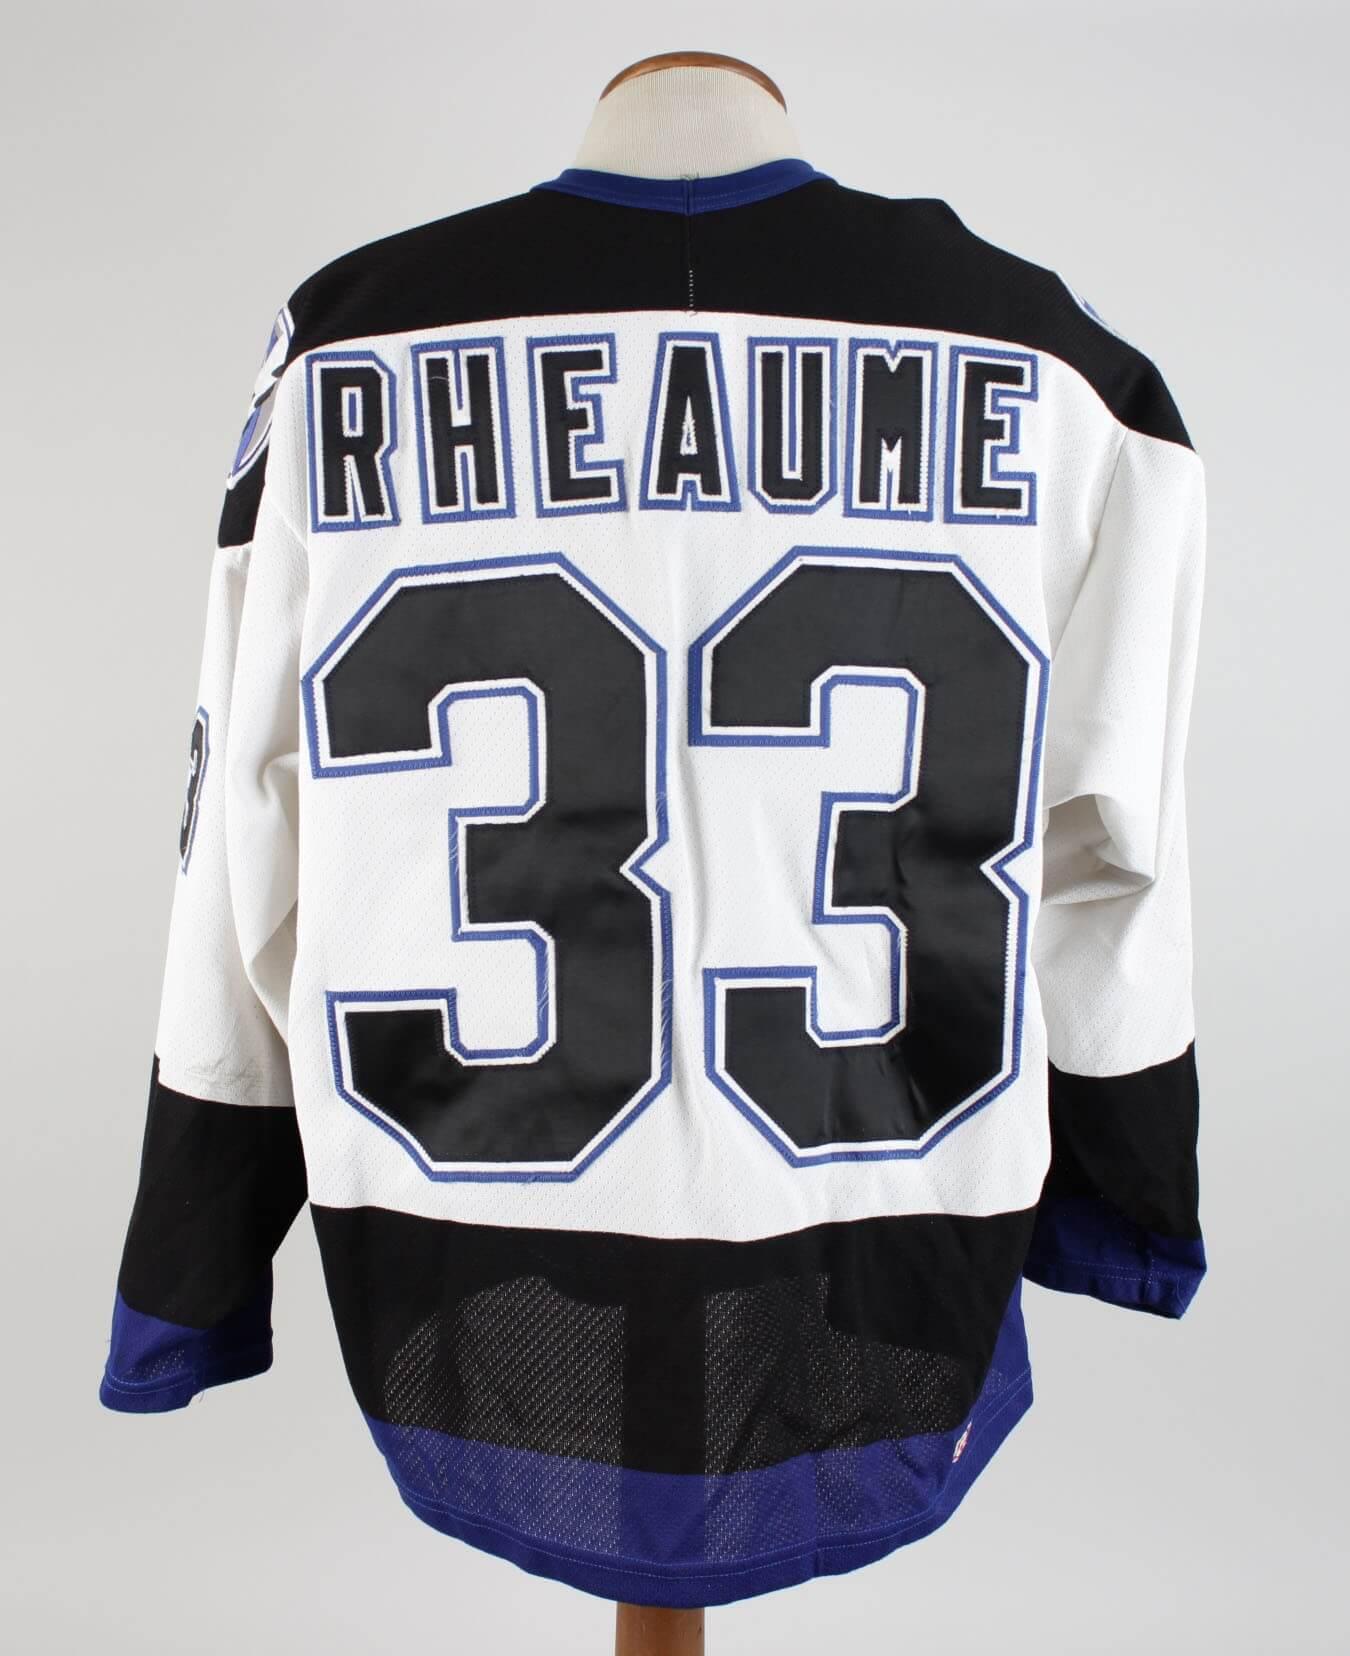 1992-93 Tampa Bay Lightning – Manon Rhéaume Jersey  0891cc1b7df